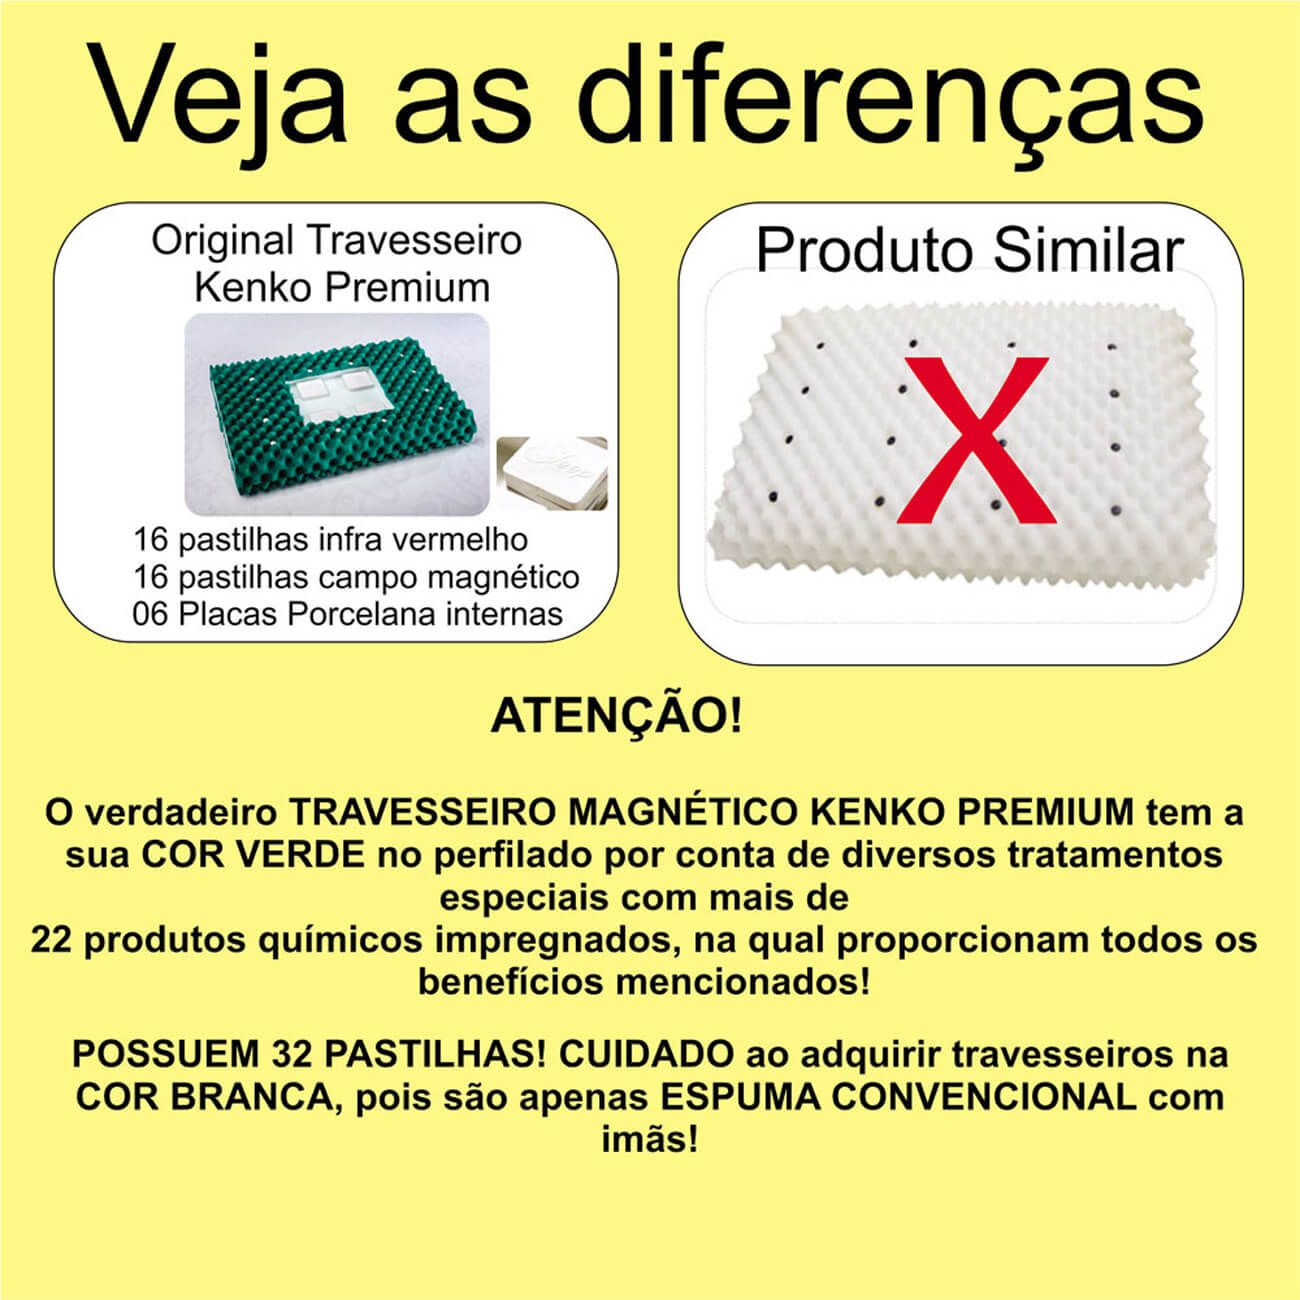 Travesseiro Magnético Kenko Premium, Modelo Luxo Exportação    - Kenko Premium Colchões